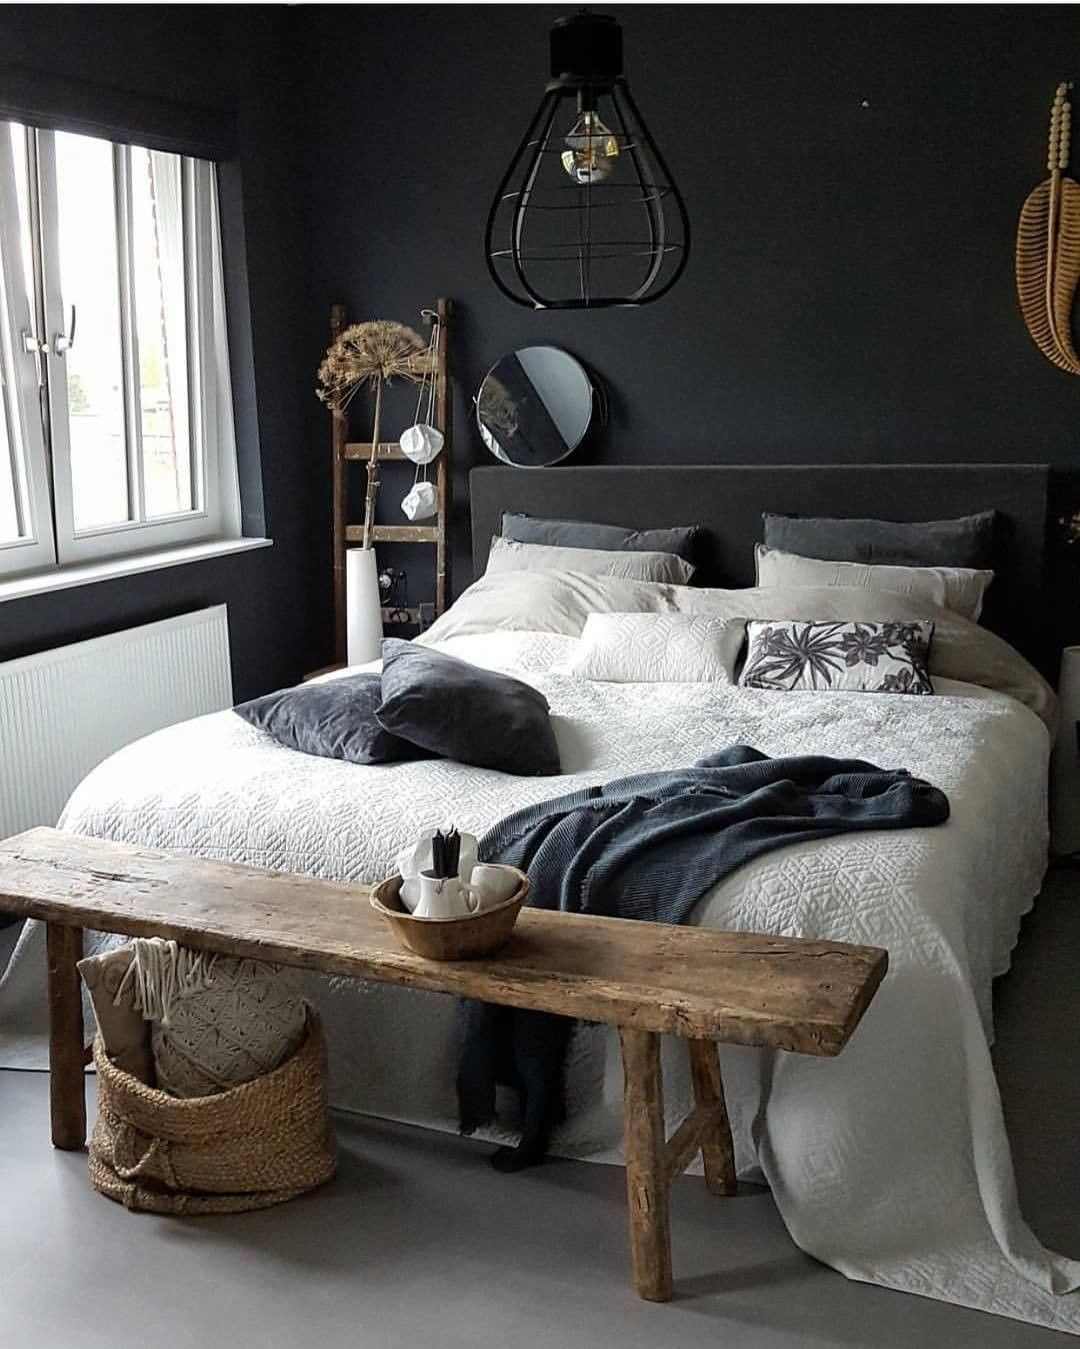 Yet another beautifully styled bedroom! via @huizedop #scandinavian #interior #homedecor #simplicity #whiteliving #makkari